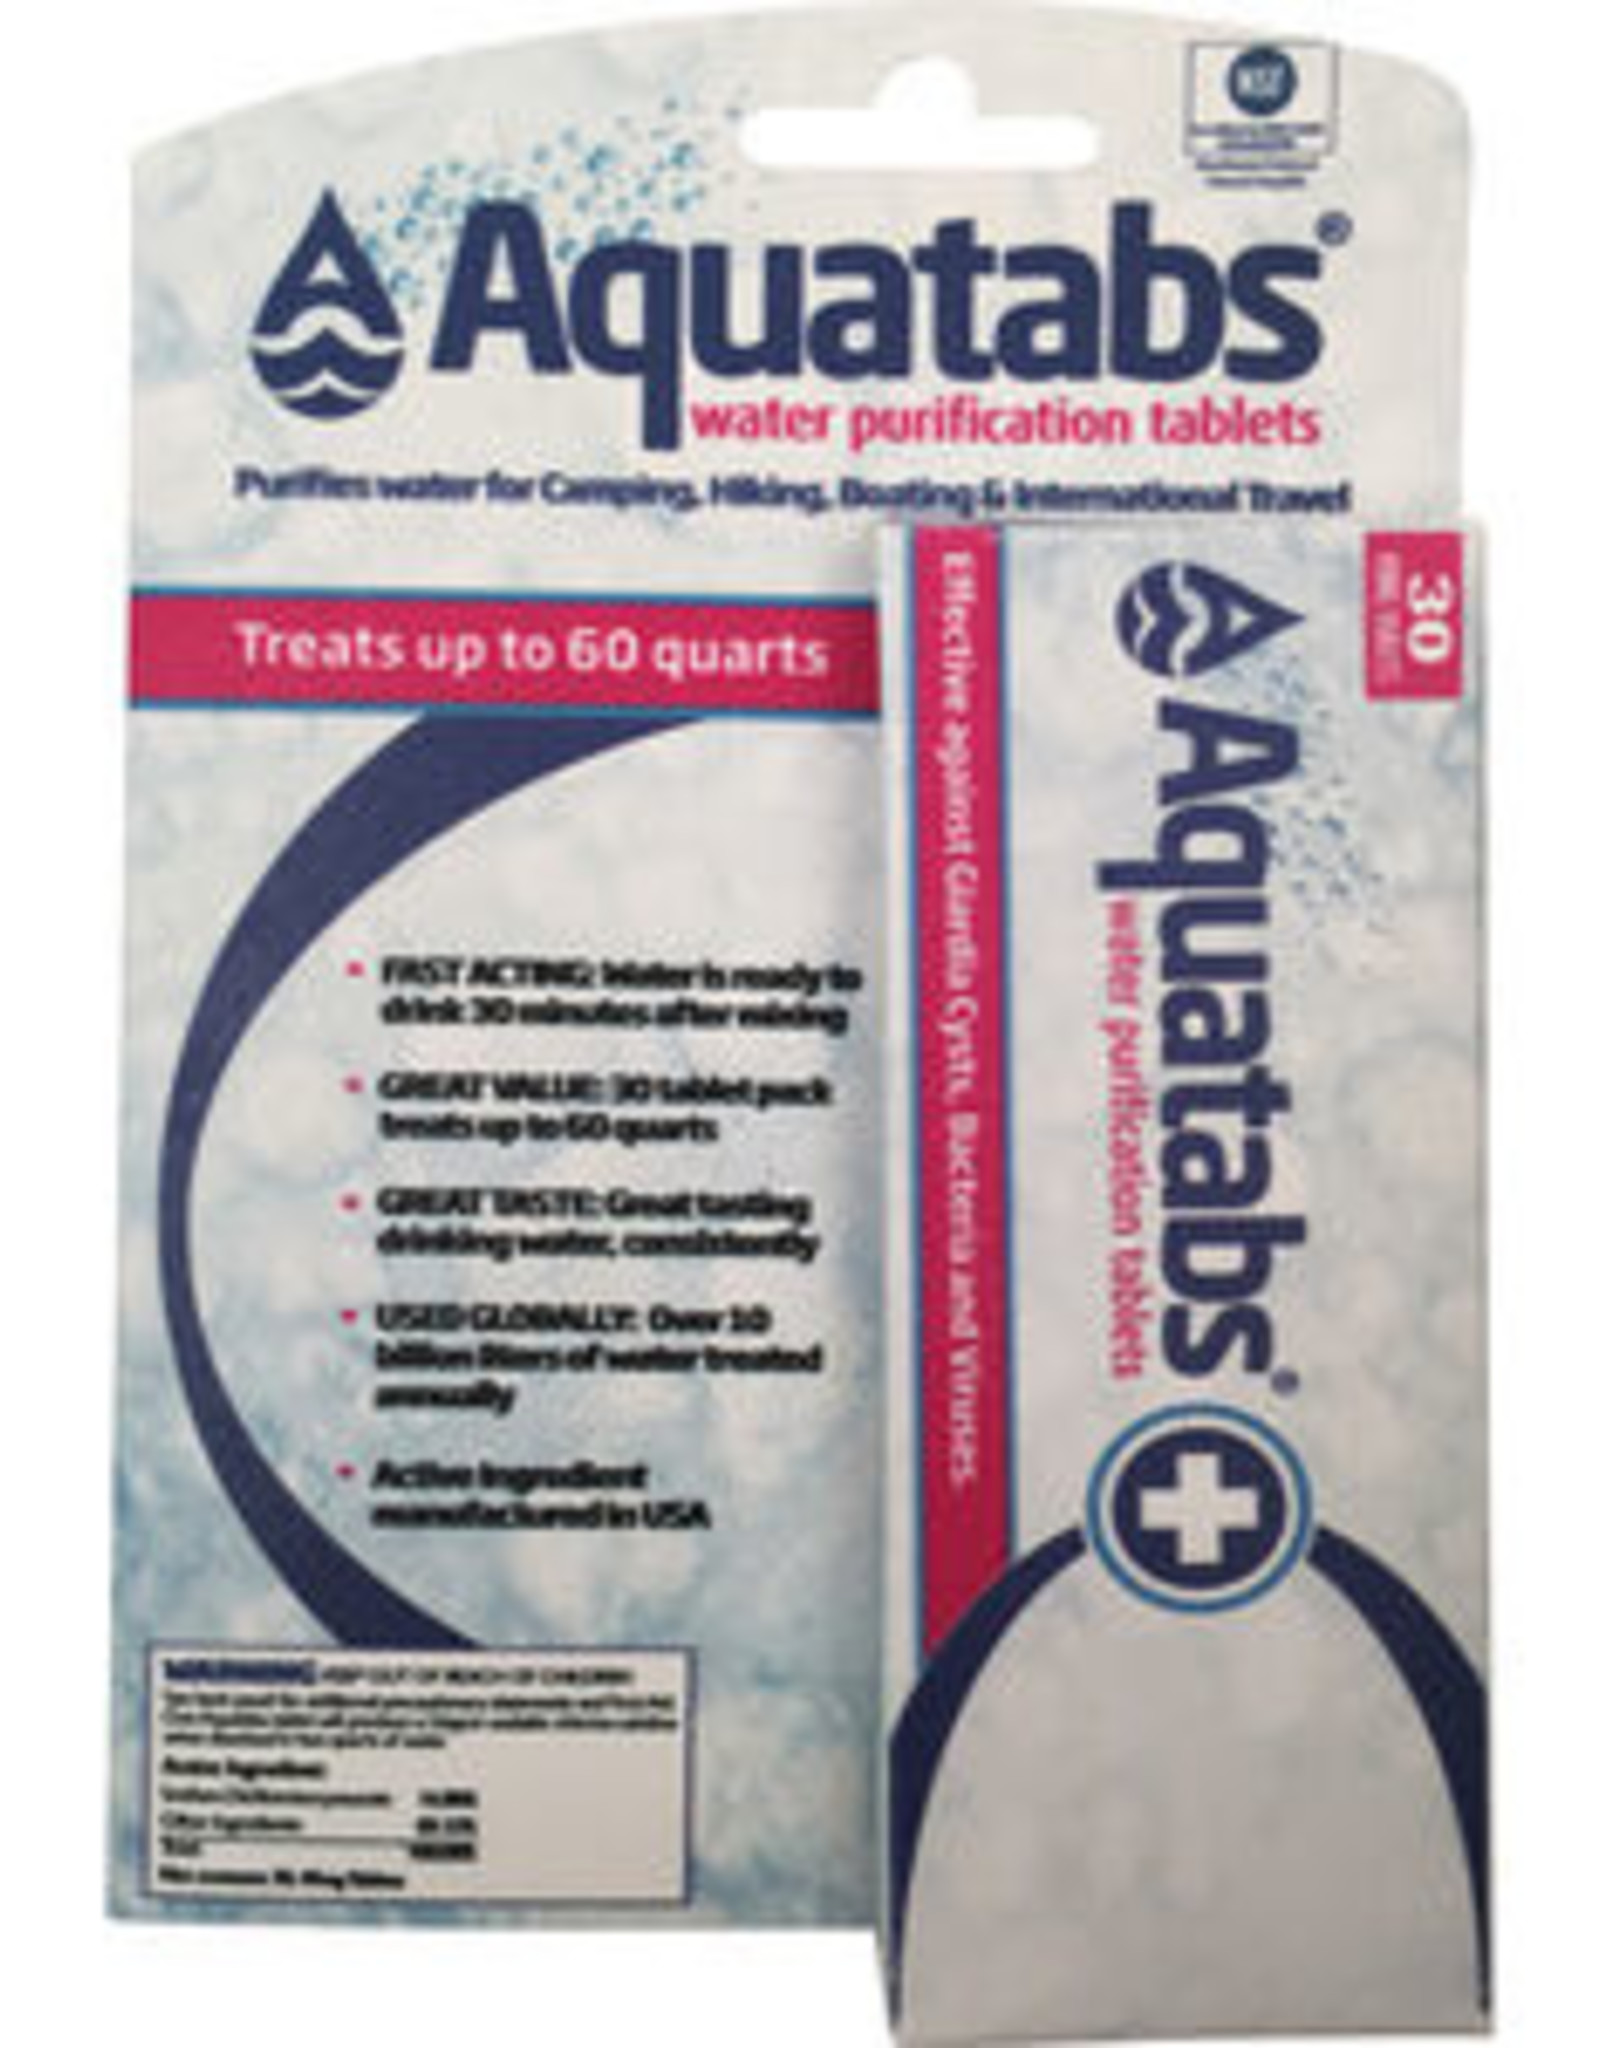 MSR MSR Aquatabs Water Purification Tablets